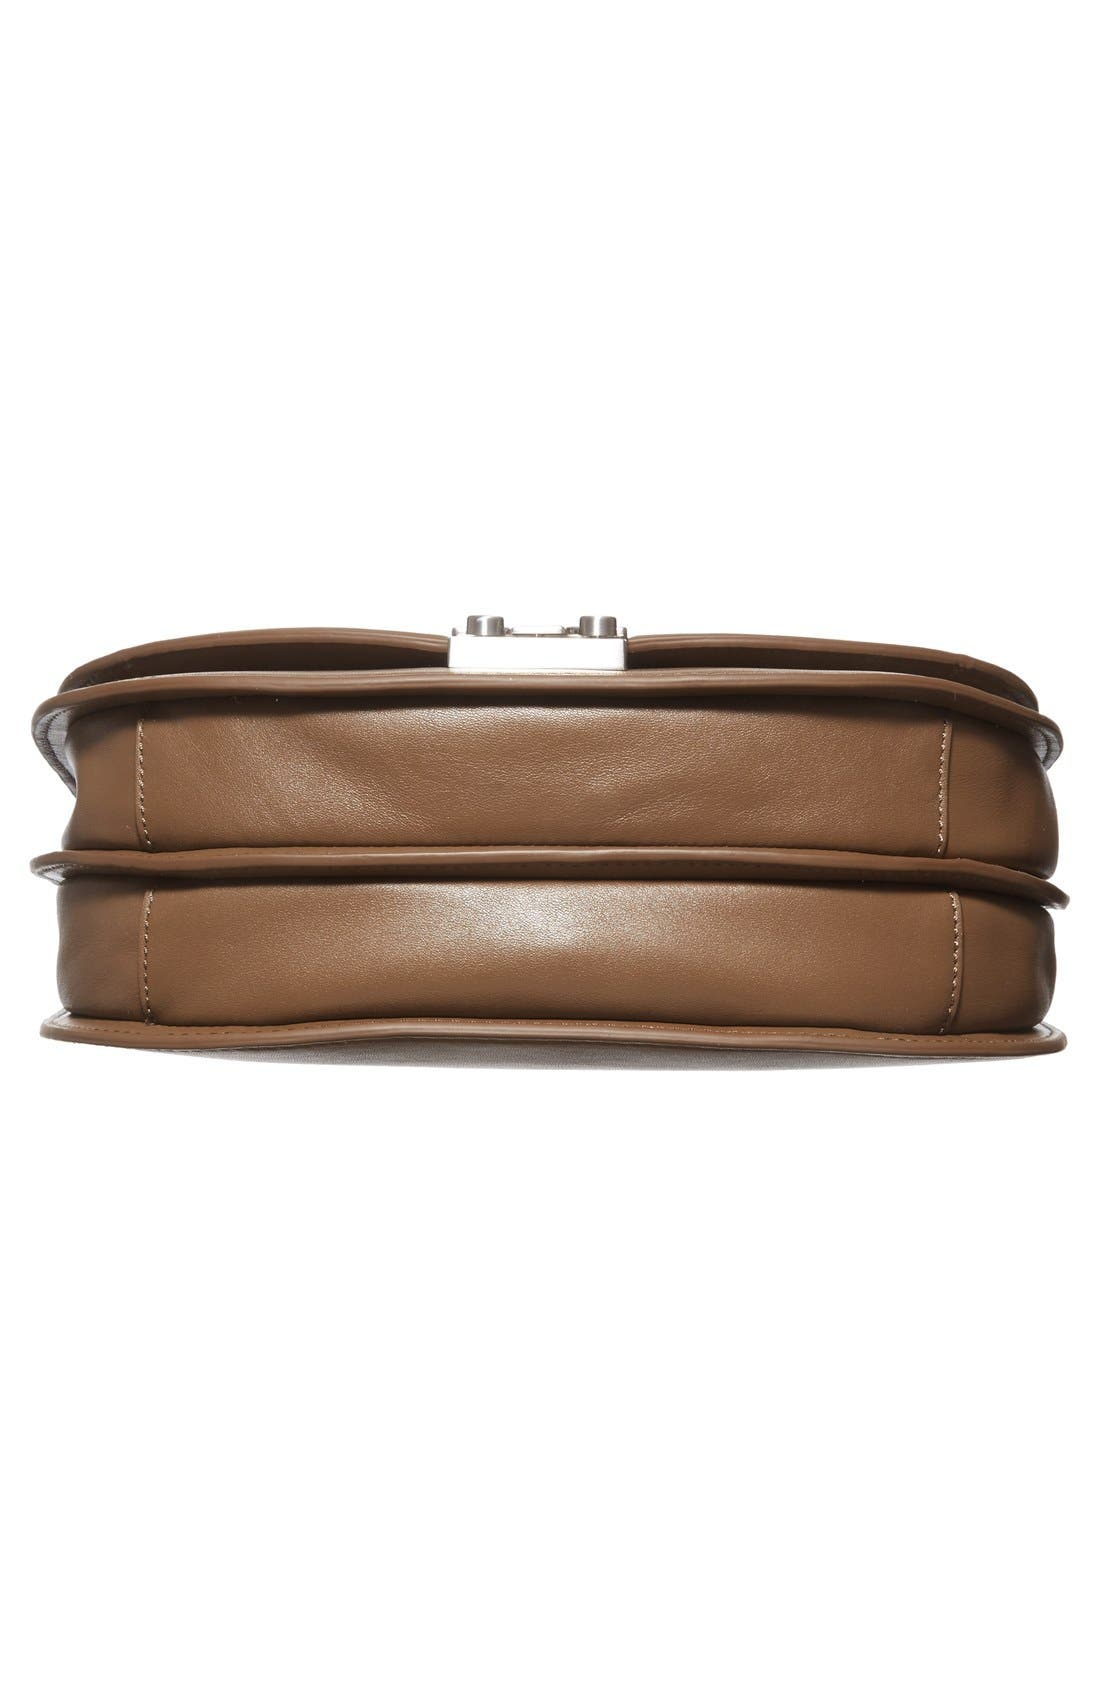 'Large' Leather Saddle Bag,                             Alternate thumbnail 6, color,                             300